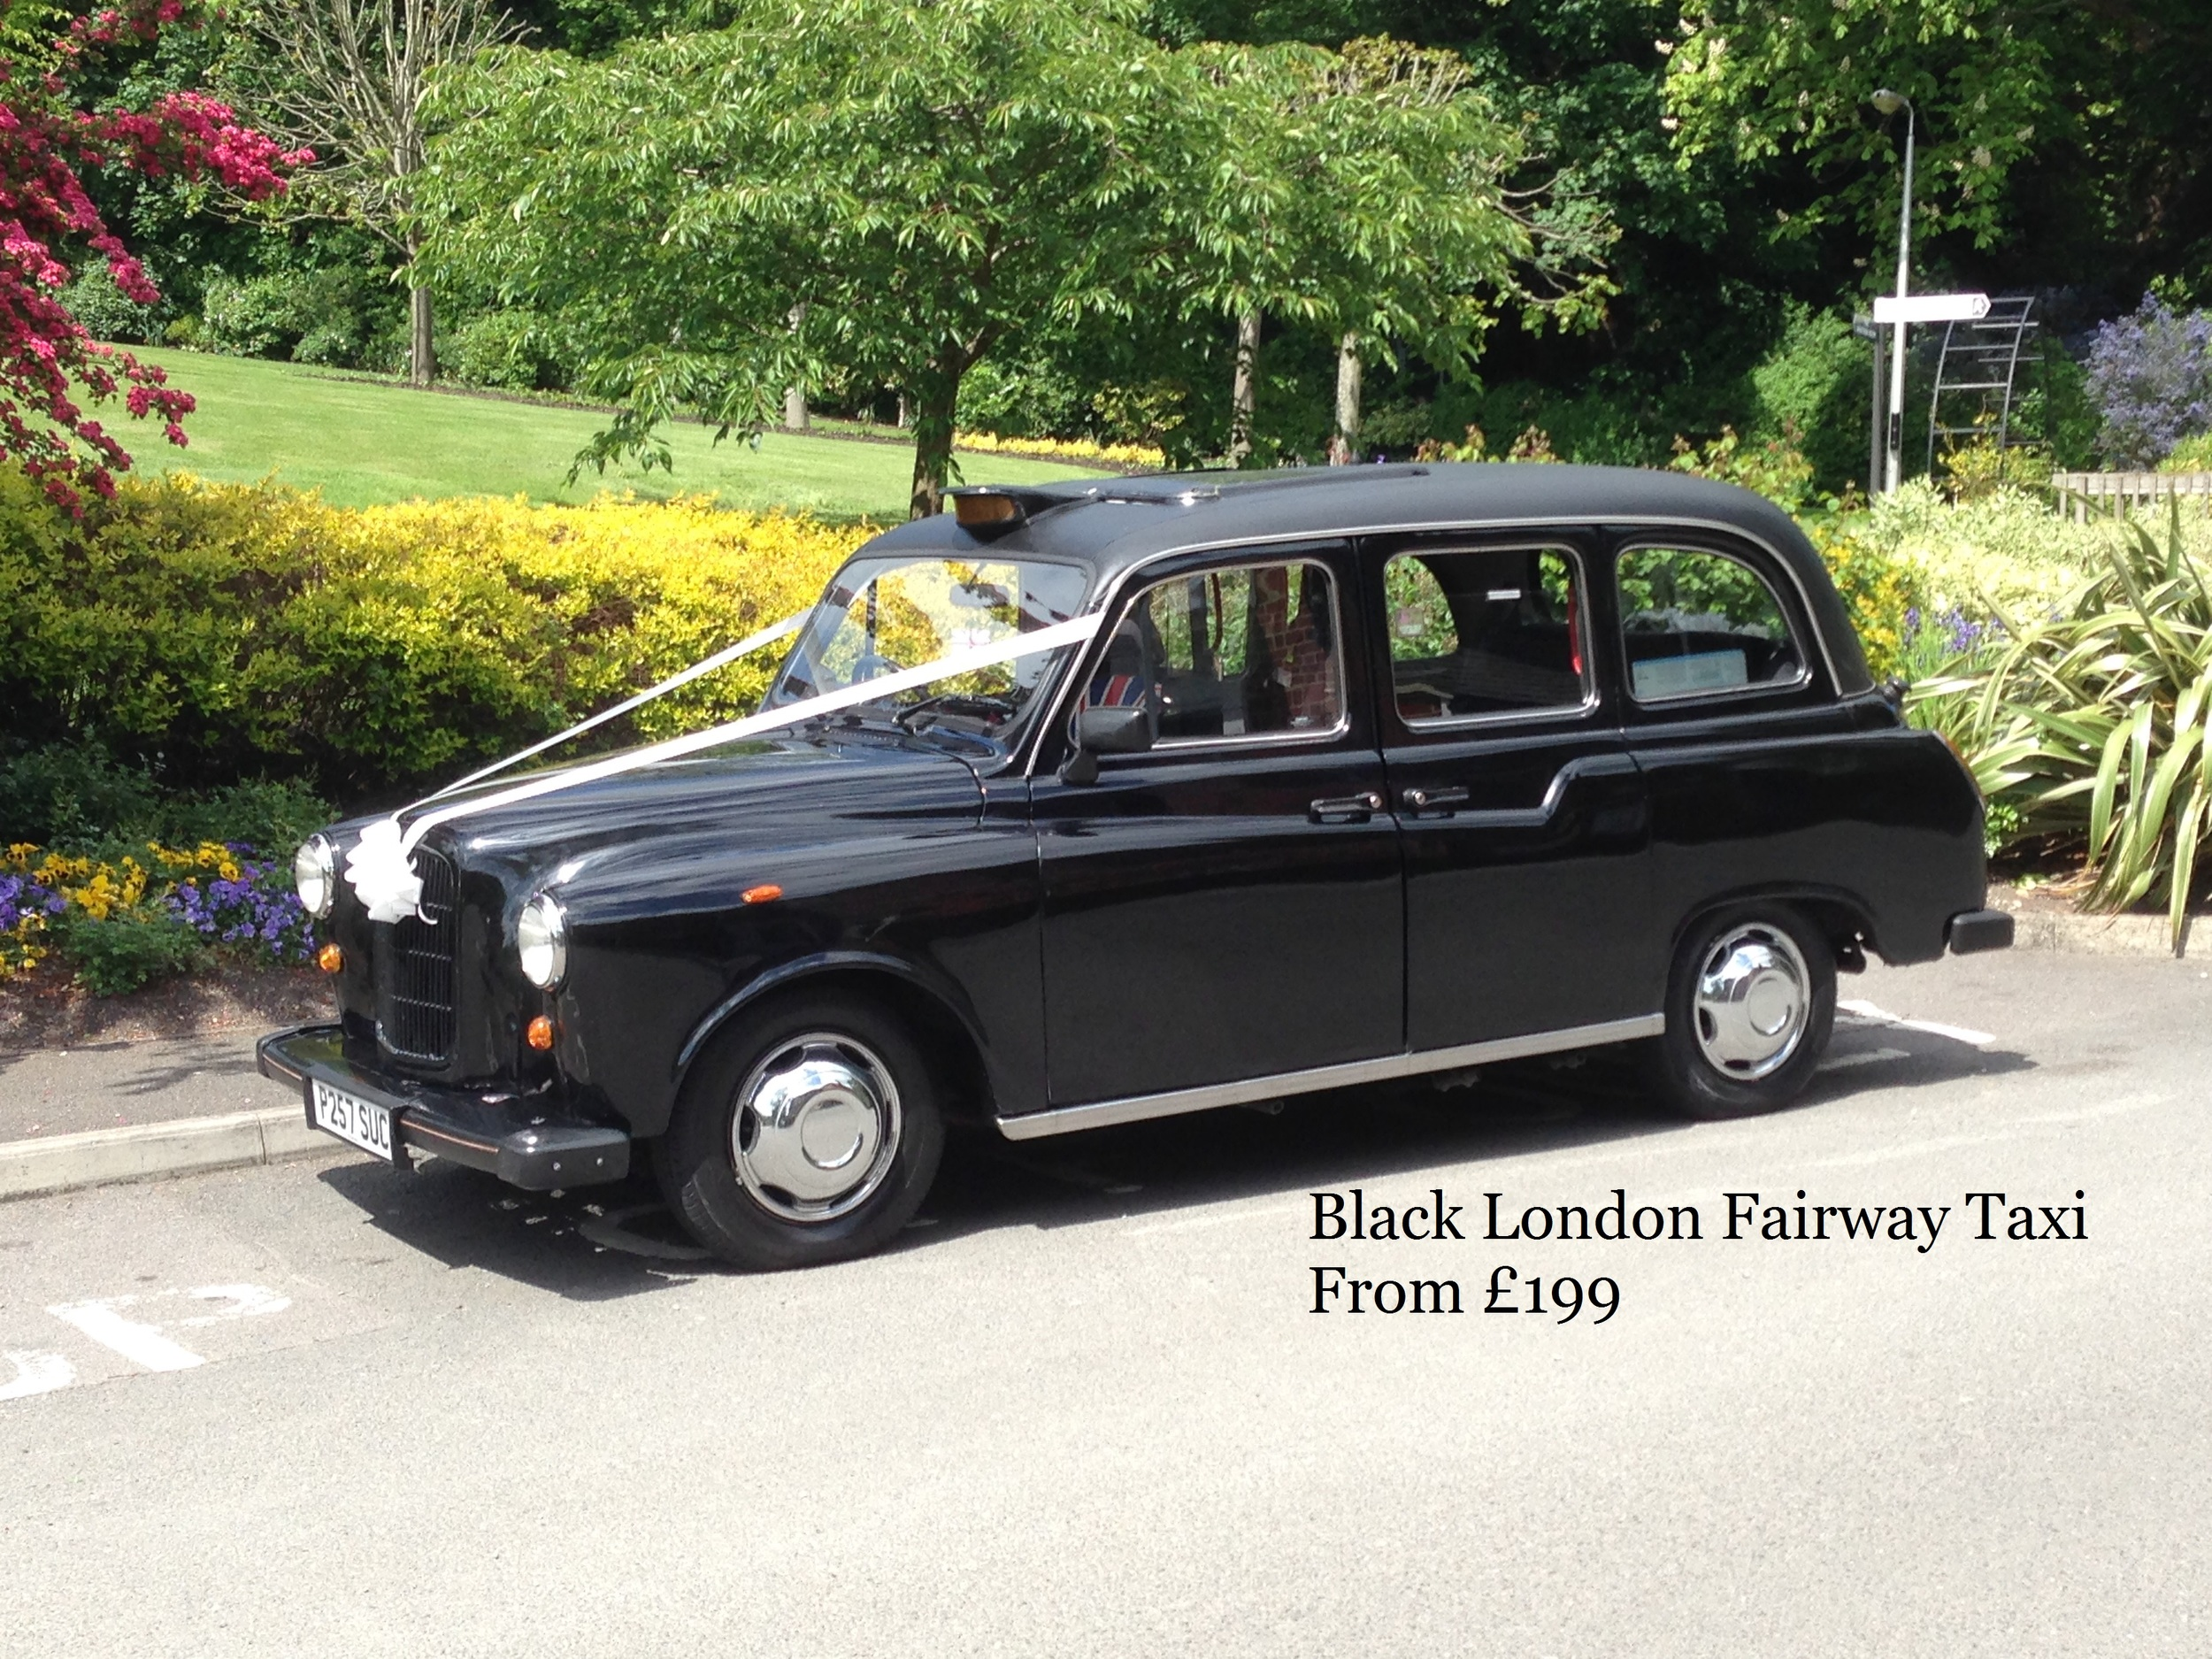 Black London Fairway Taxi